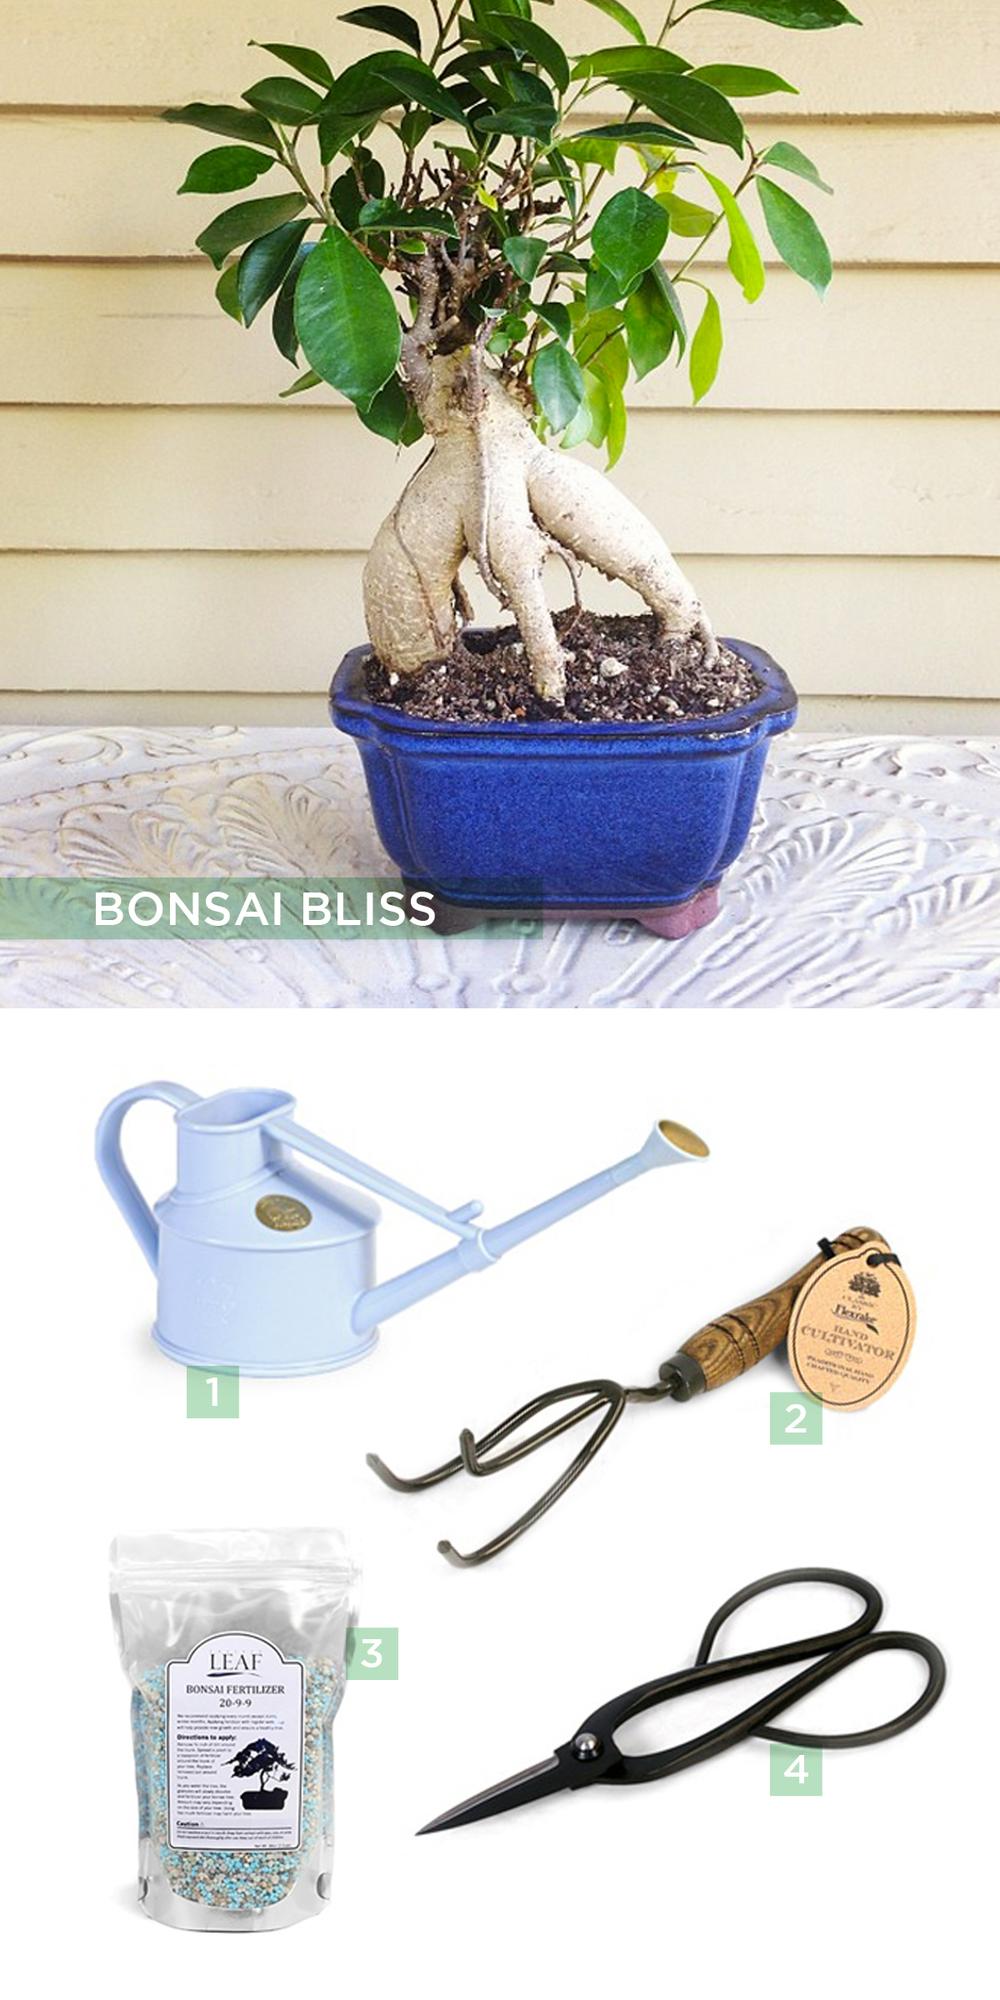 Bonsai-Bliss.jpg